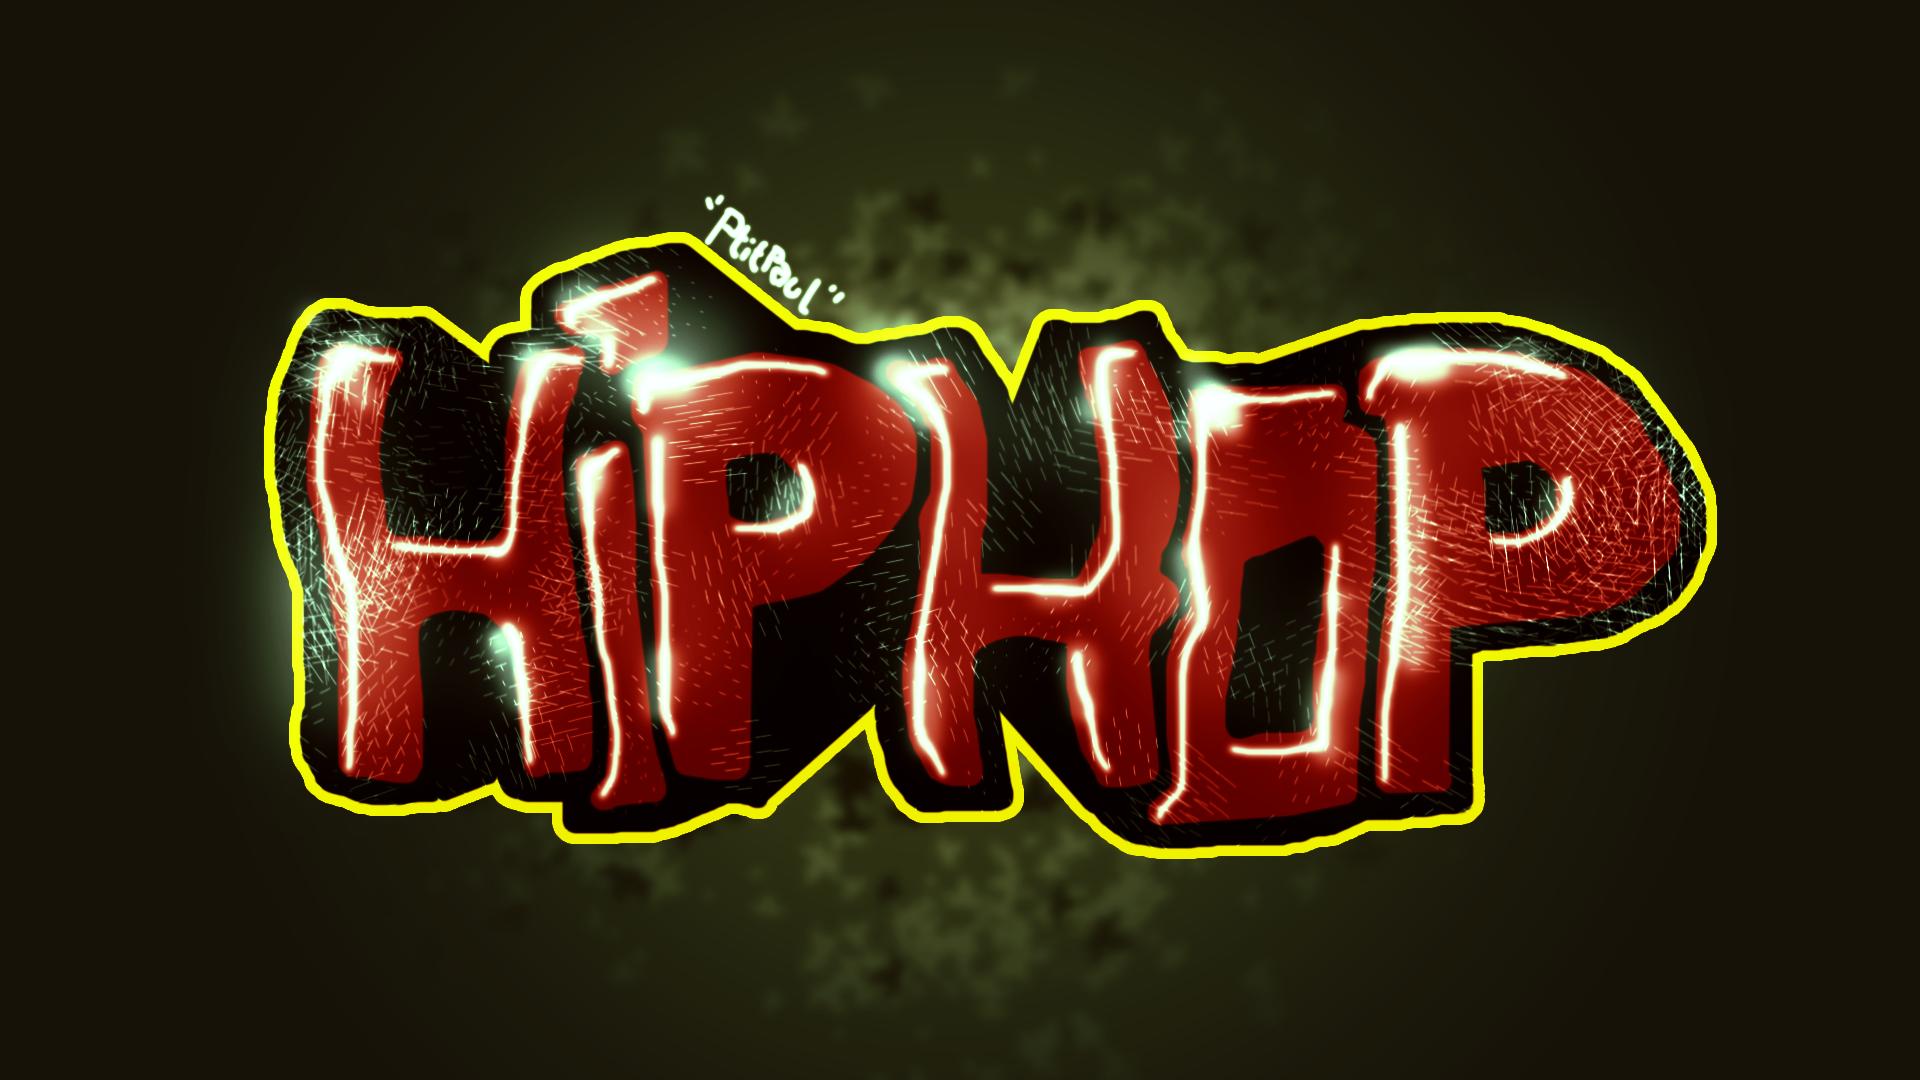 Hiphop Graffiti By Ptitpauldesign On Deviantart Graffiti Wallpaper Graffiti Graffiti Tattoo